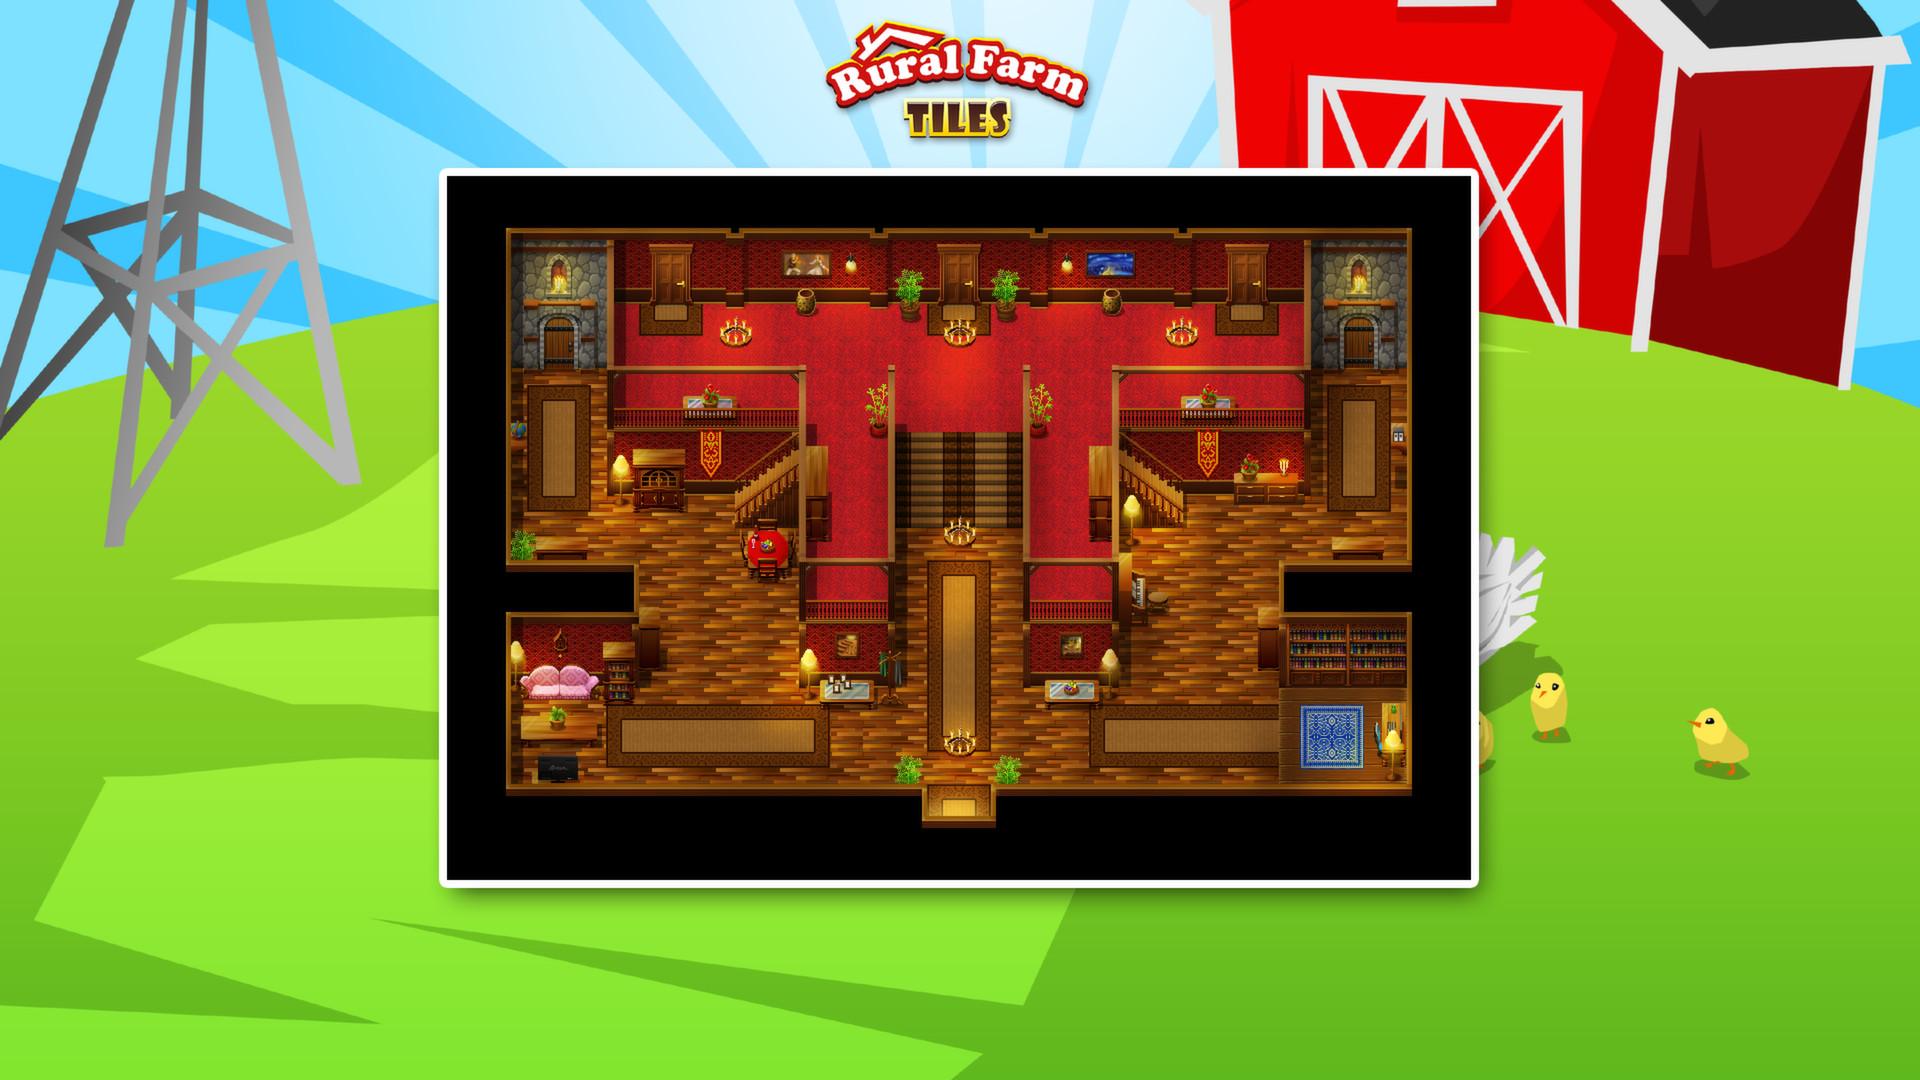 RPG Maker VX Ace - Rural Farm Tiles Resource Pack on Steam